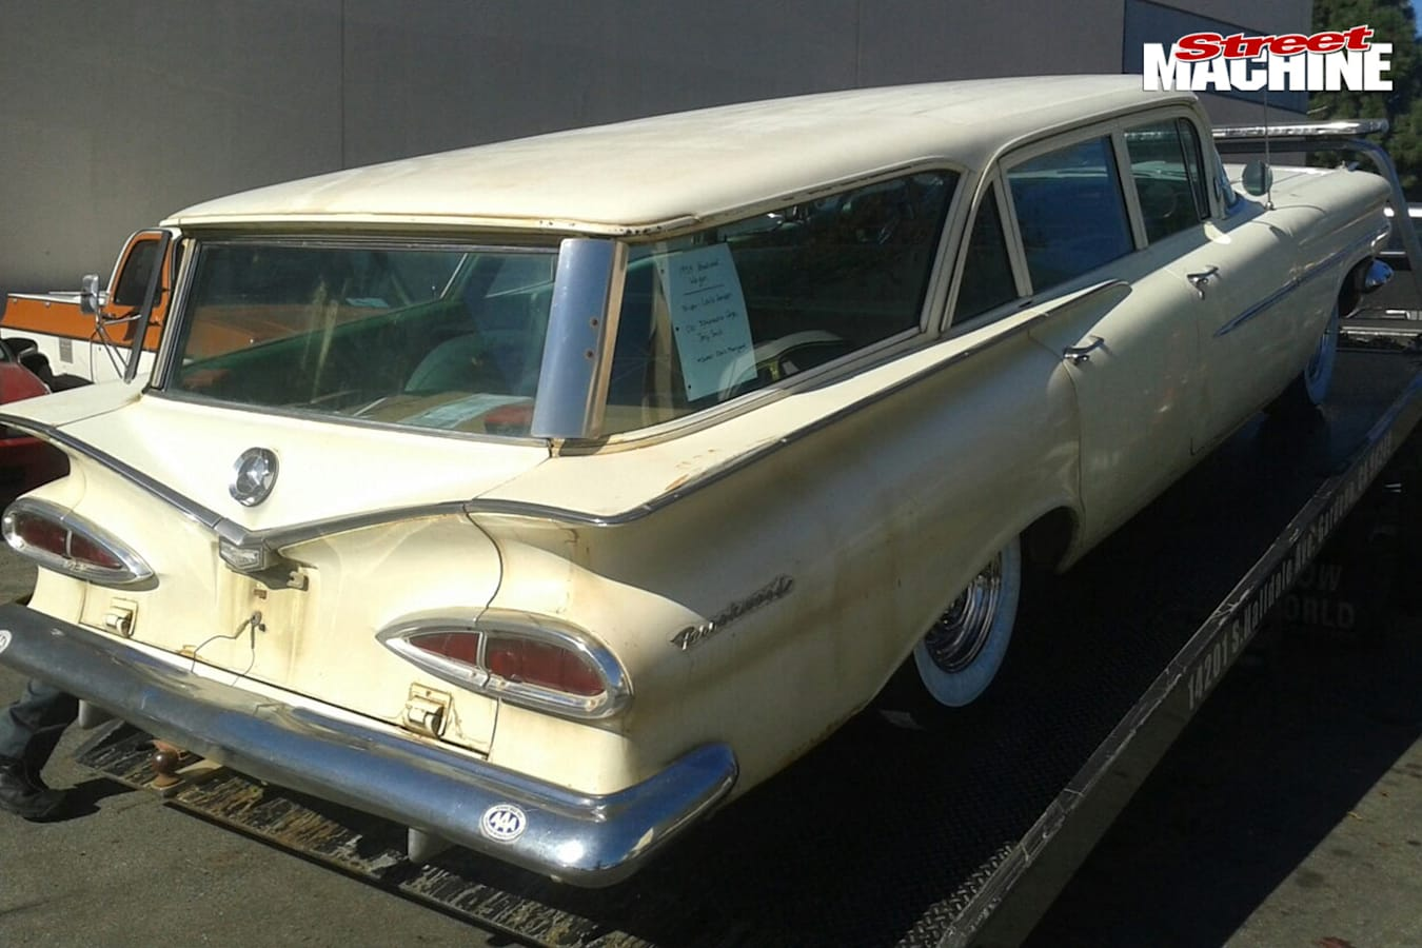 Chev brookwood wagon rear